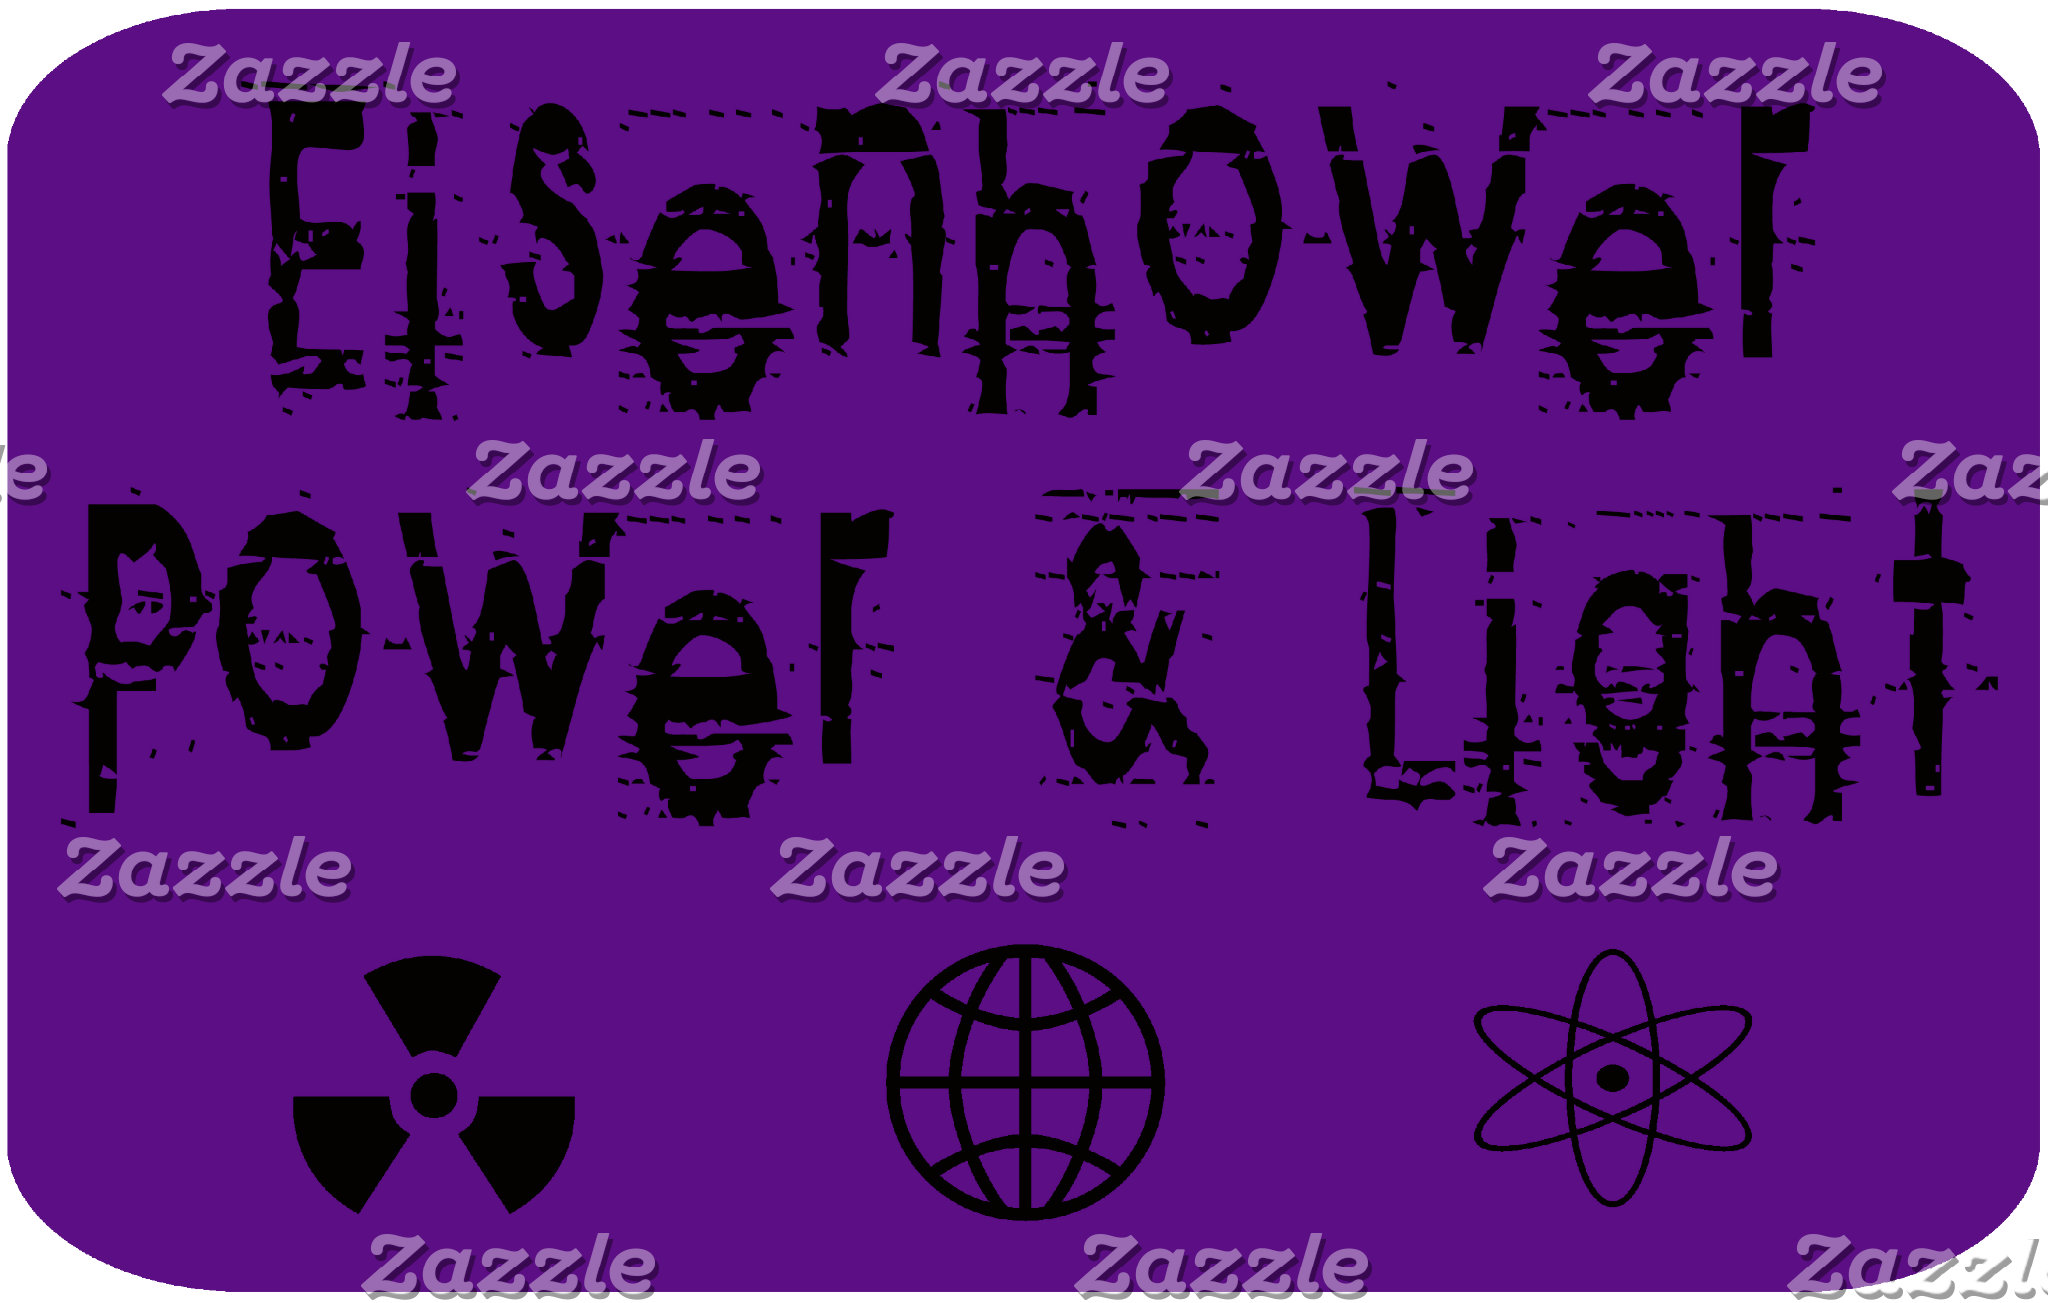 Eisenhower Power and Light